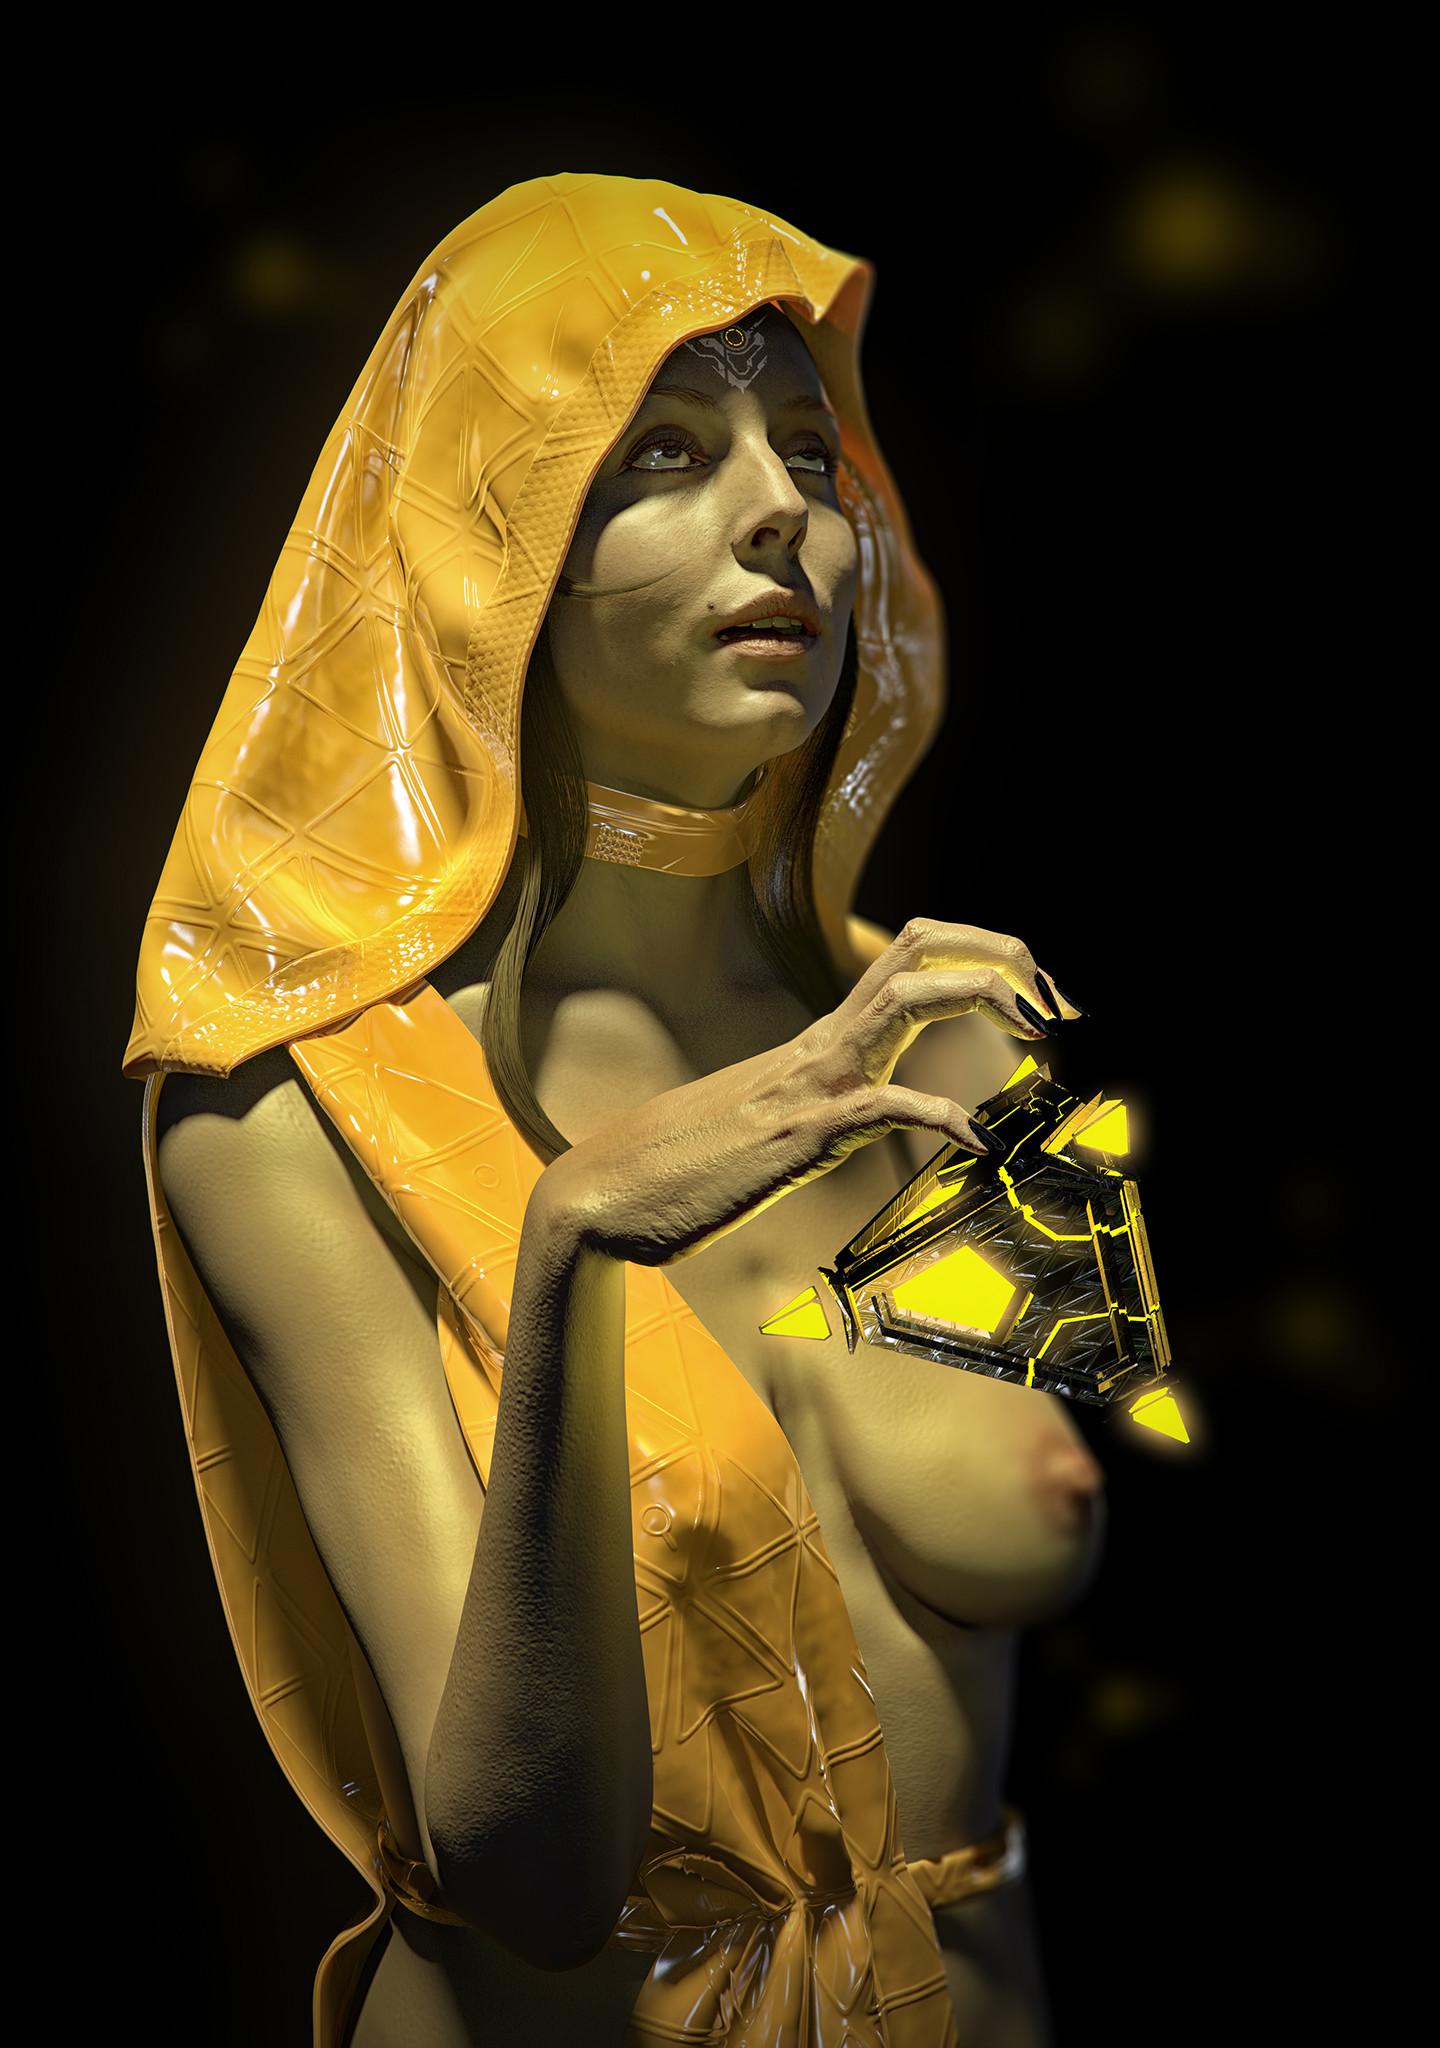 Piotr rusnarczyk yellow hood 01